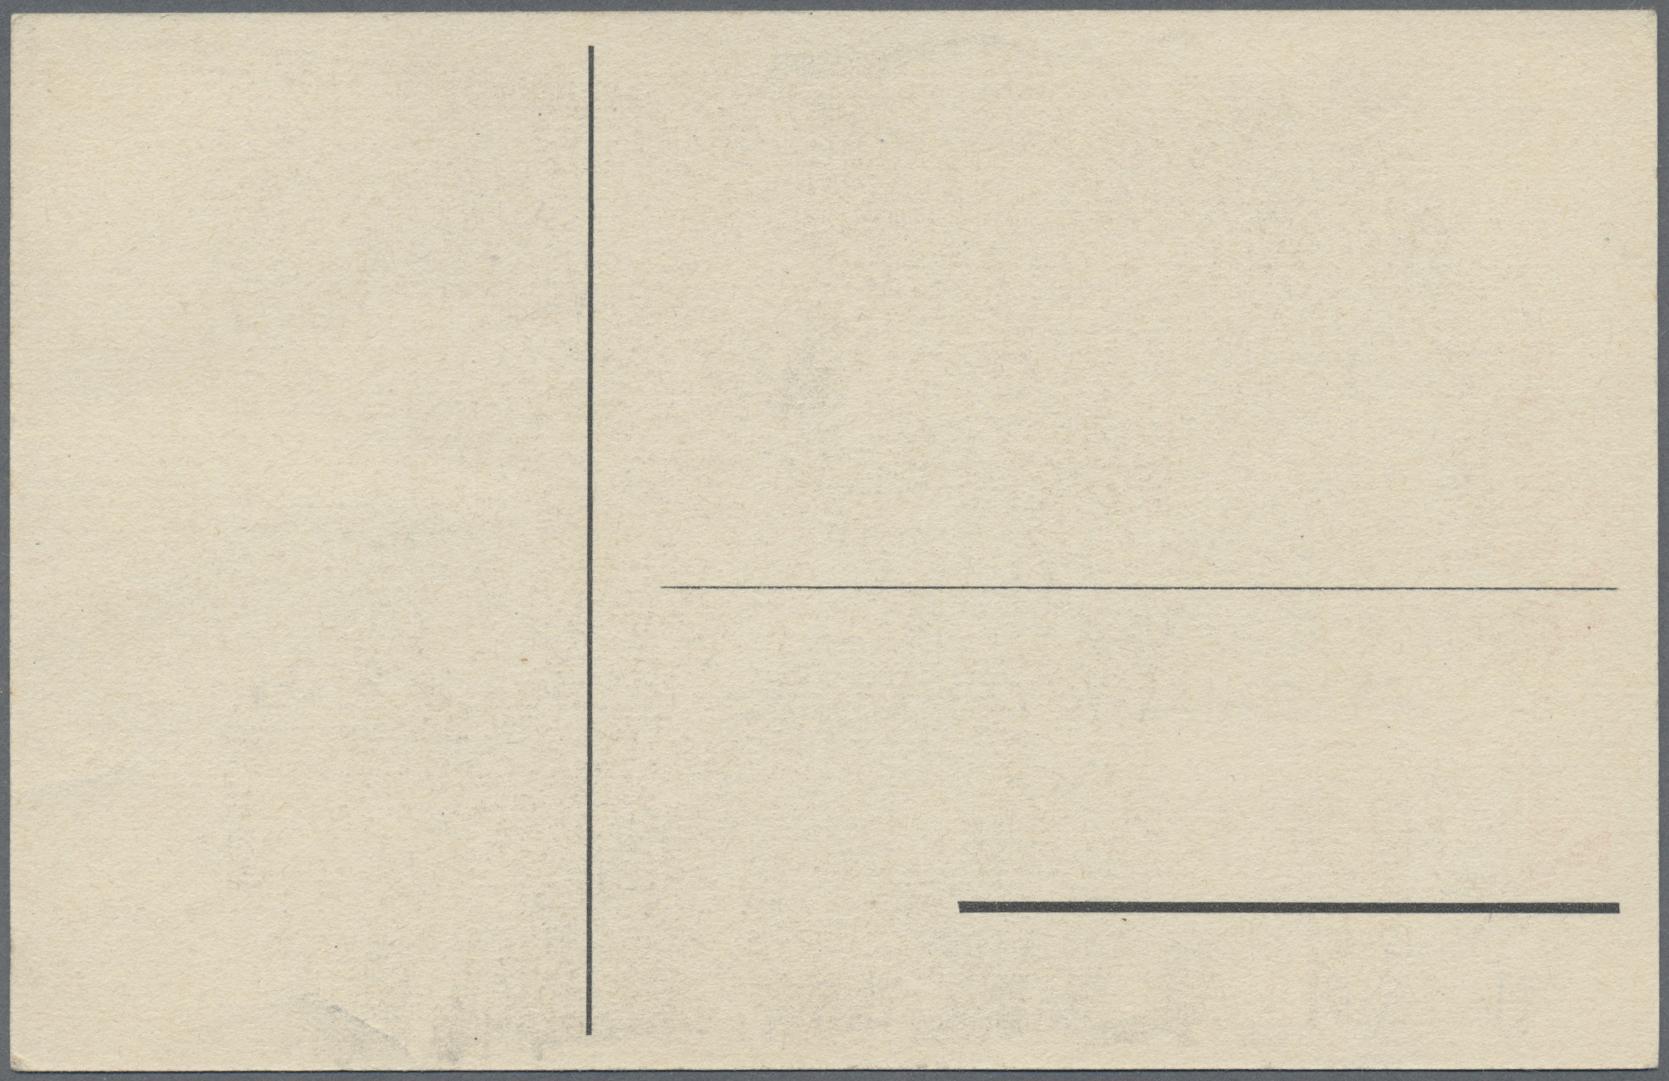 Lot 23610 - Kriegs- und Propagandafälschungen  -  Auktionshaus Christoph Gärtner GmbH & Co. KG Single lots Germany + Picture Postcards. Auction #39 Day 5